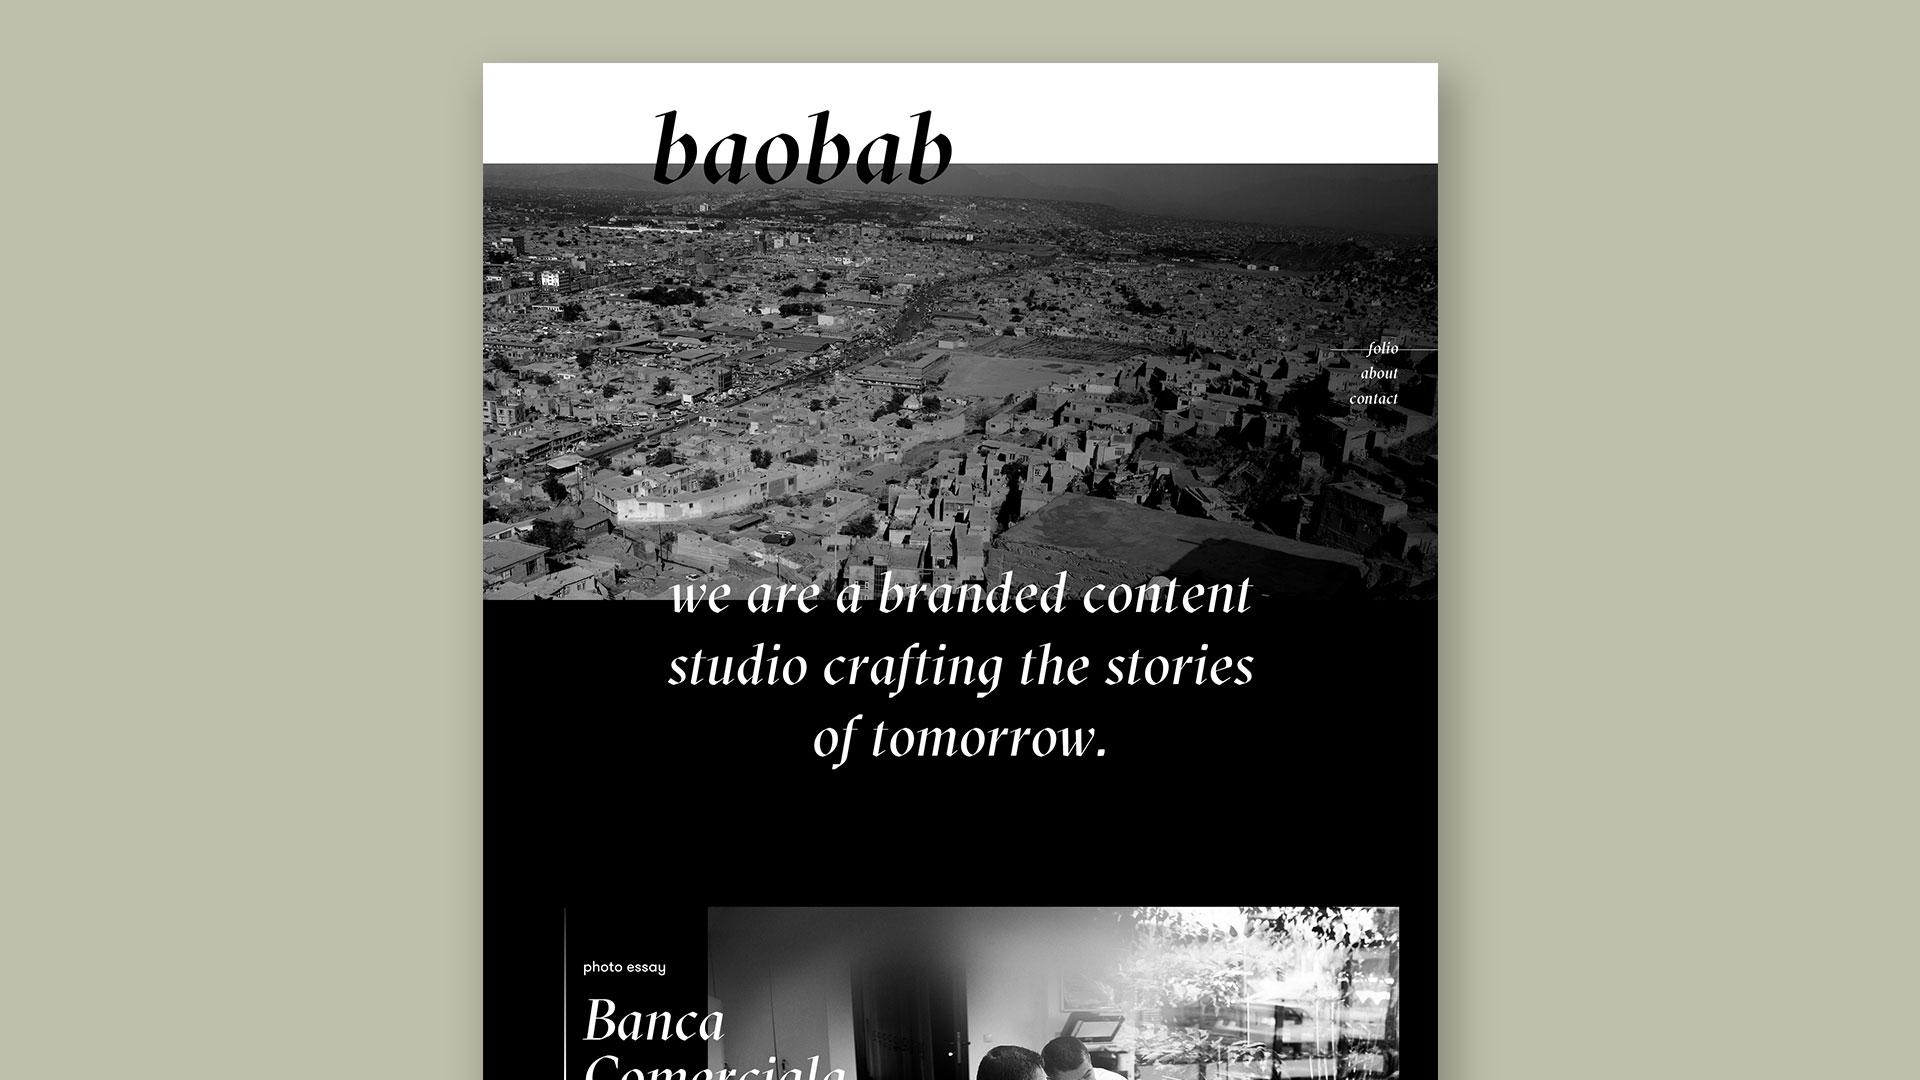 baoba2.jpg